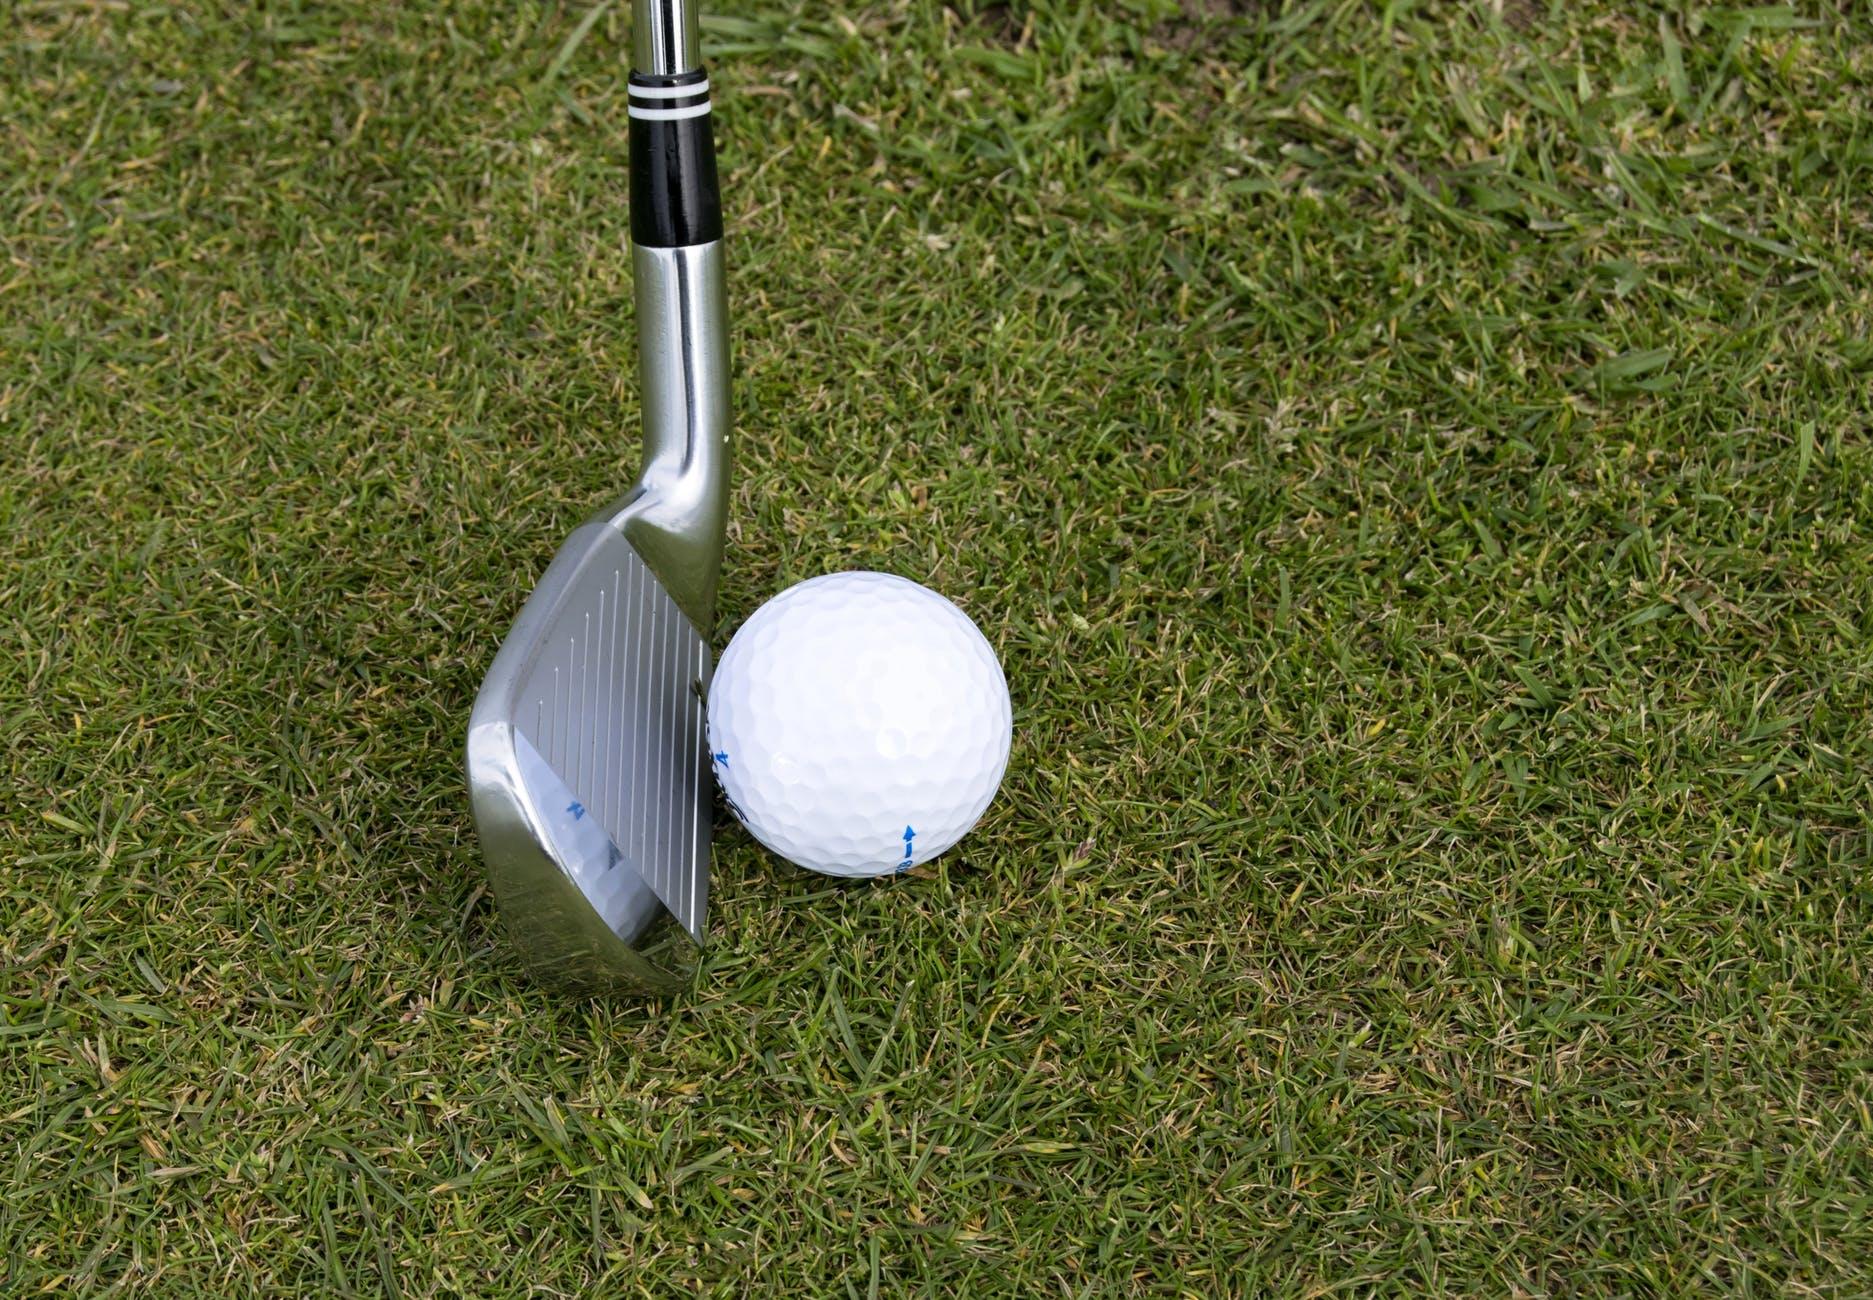 Stretch golf